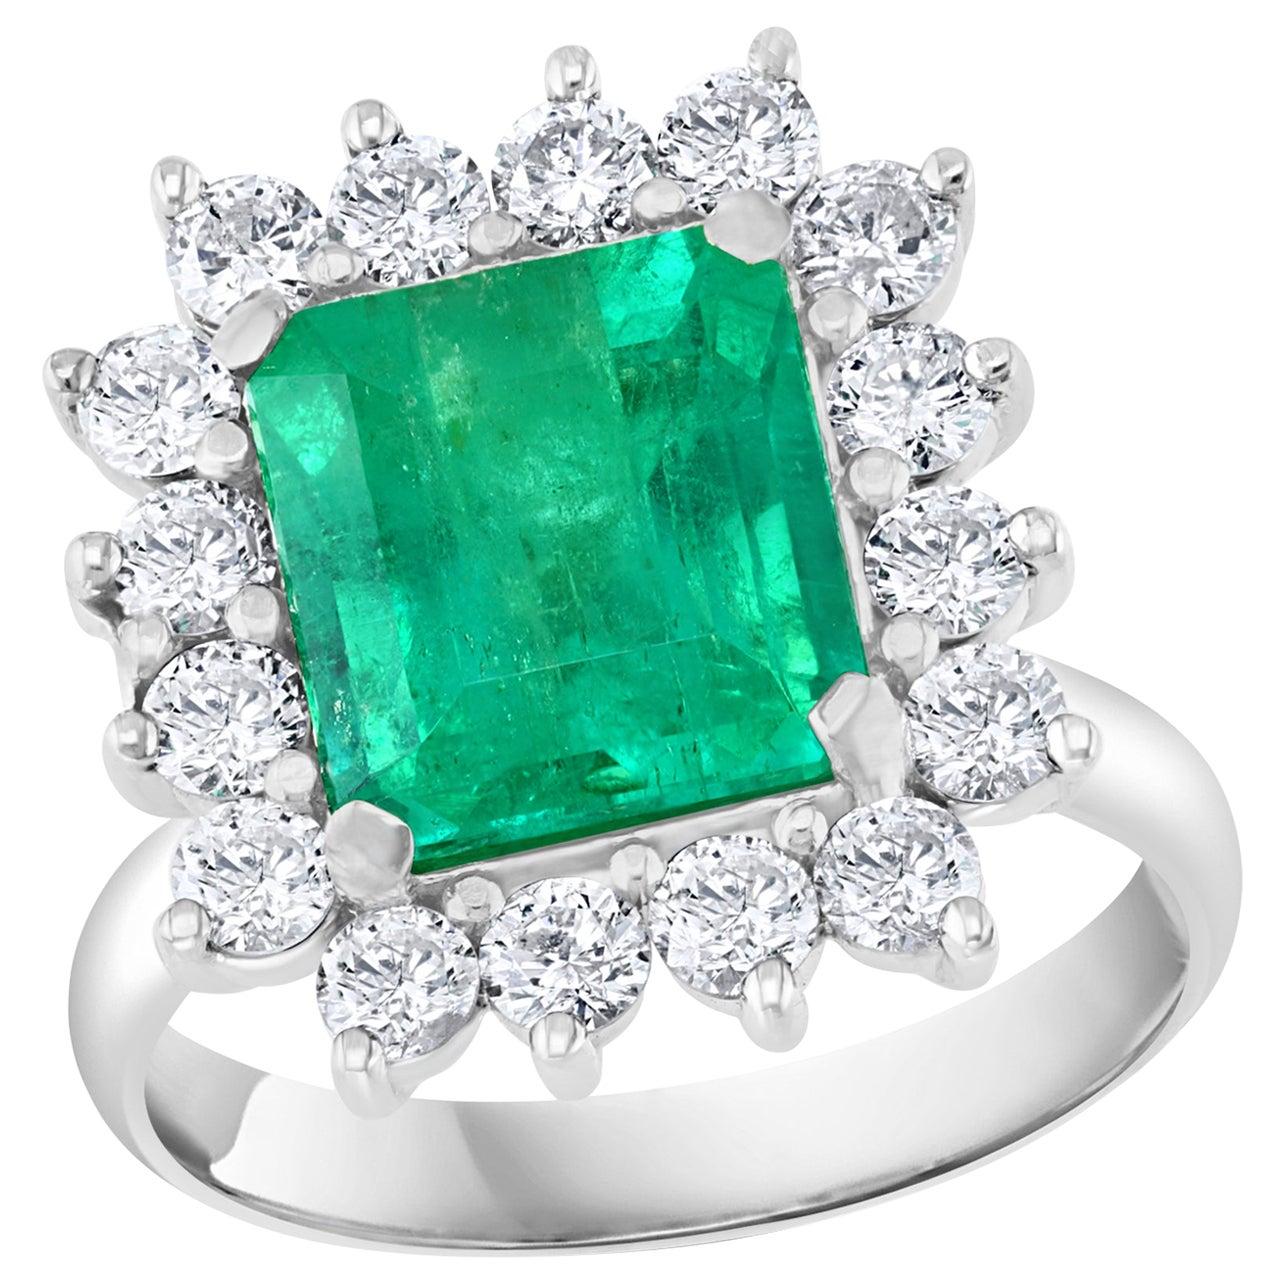 4 Carat Emerald Cut Colombian Emerald and Diamond Ring 14 Karat White Gold